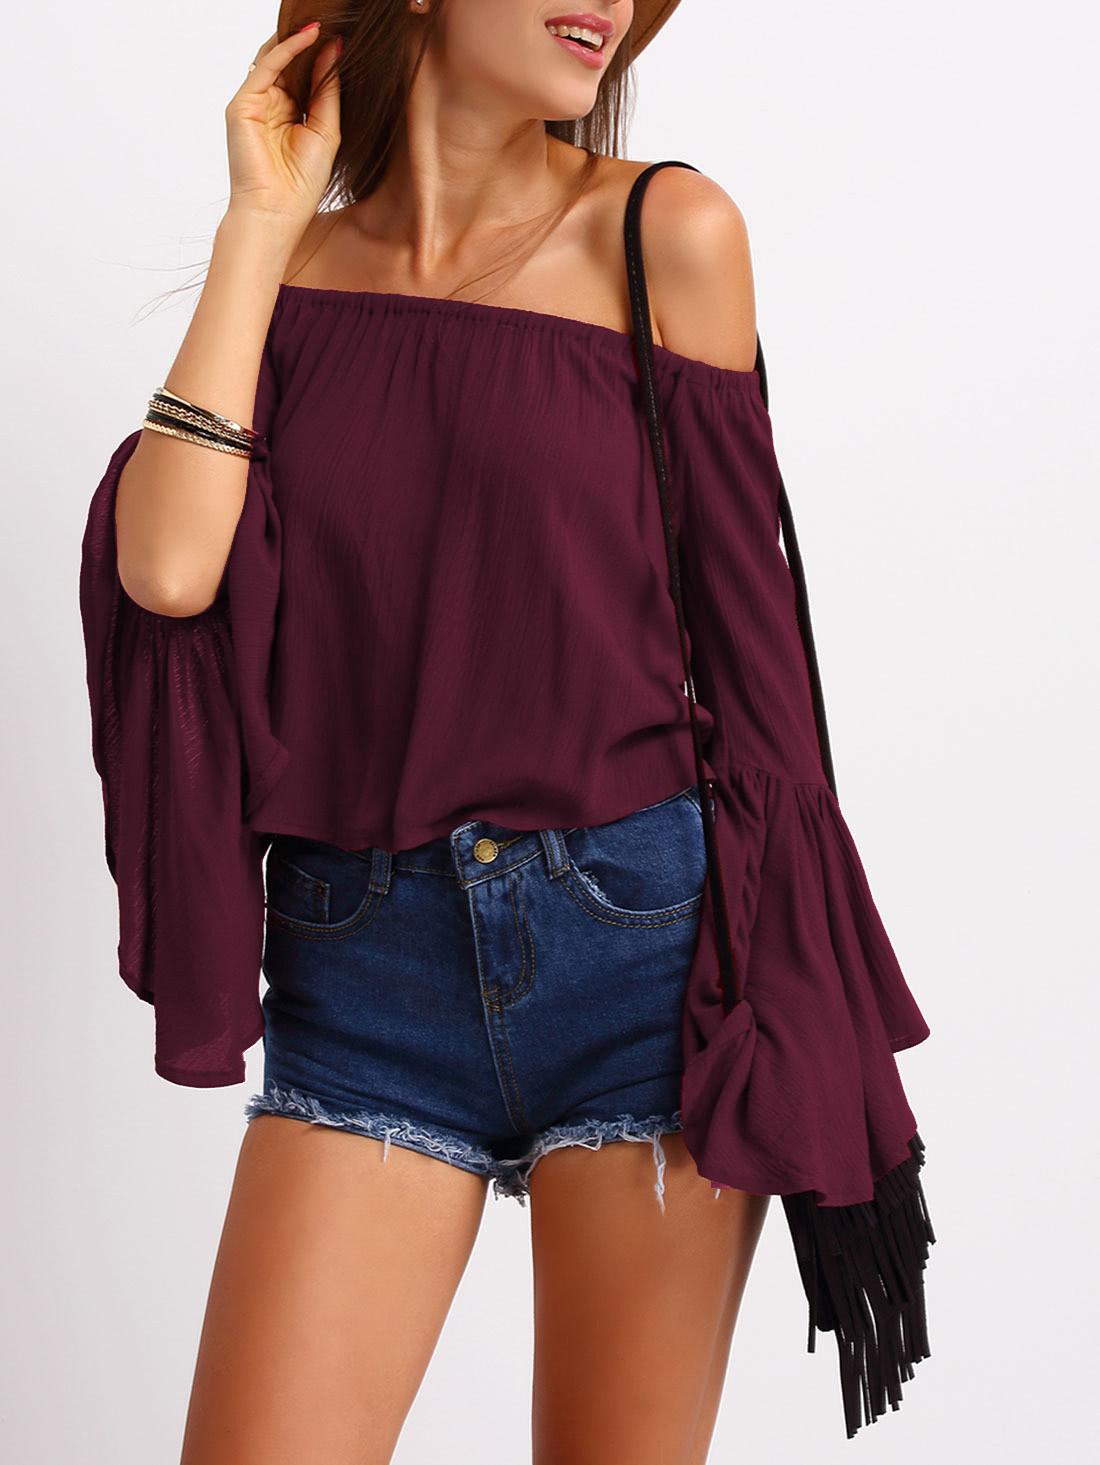 Burgundy Off the Shoulder Bell Sleeve Top blouse160308050